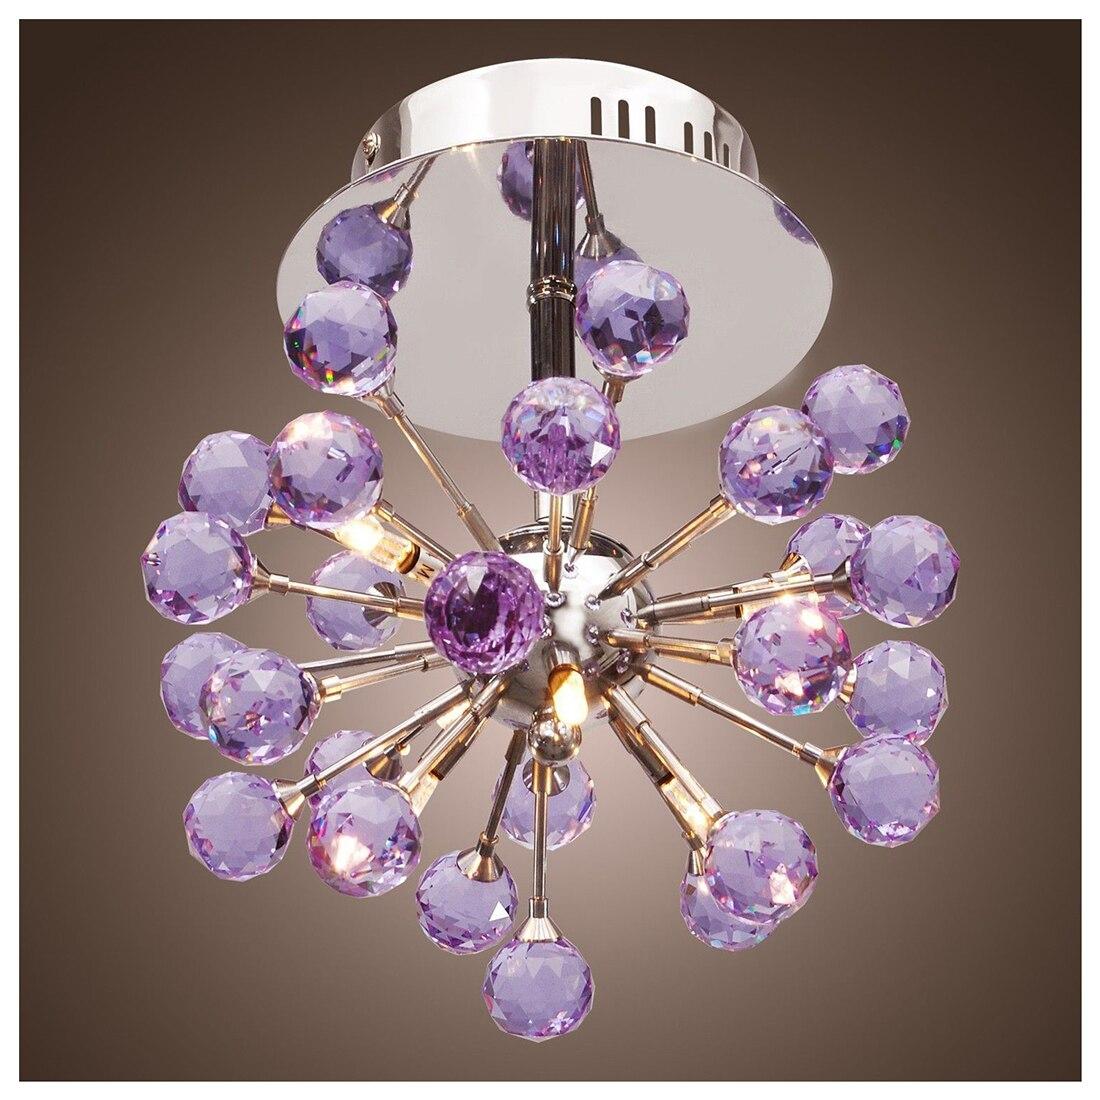 Practical-Elegant Flush Mount Crystal Chandelier Ceiling Pendant Lamp Fixture light Purple